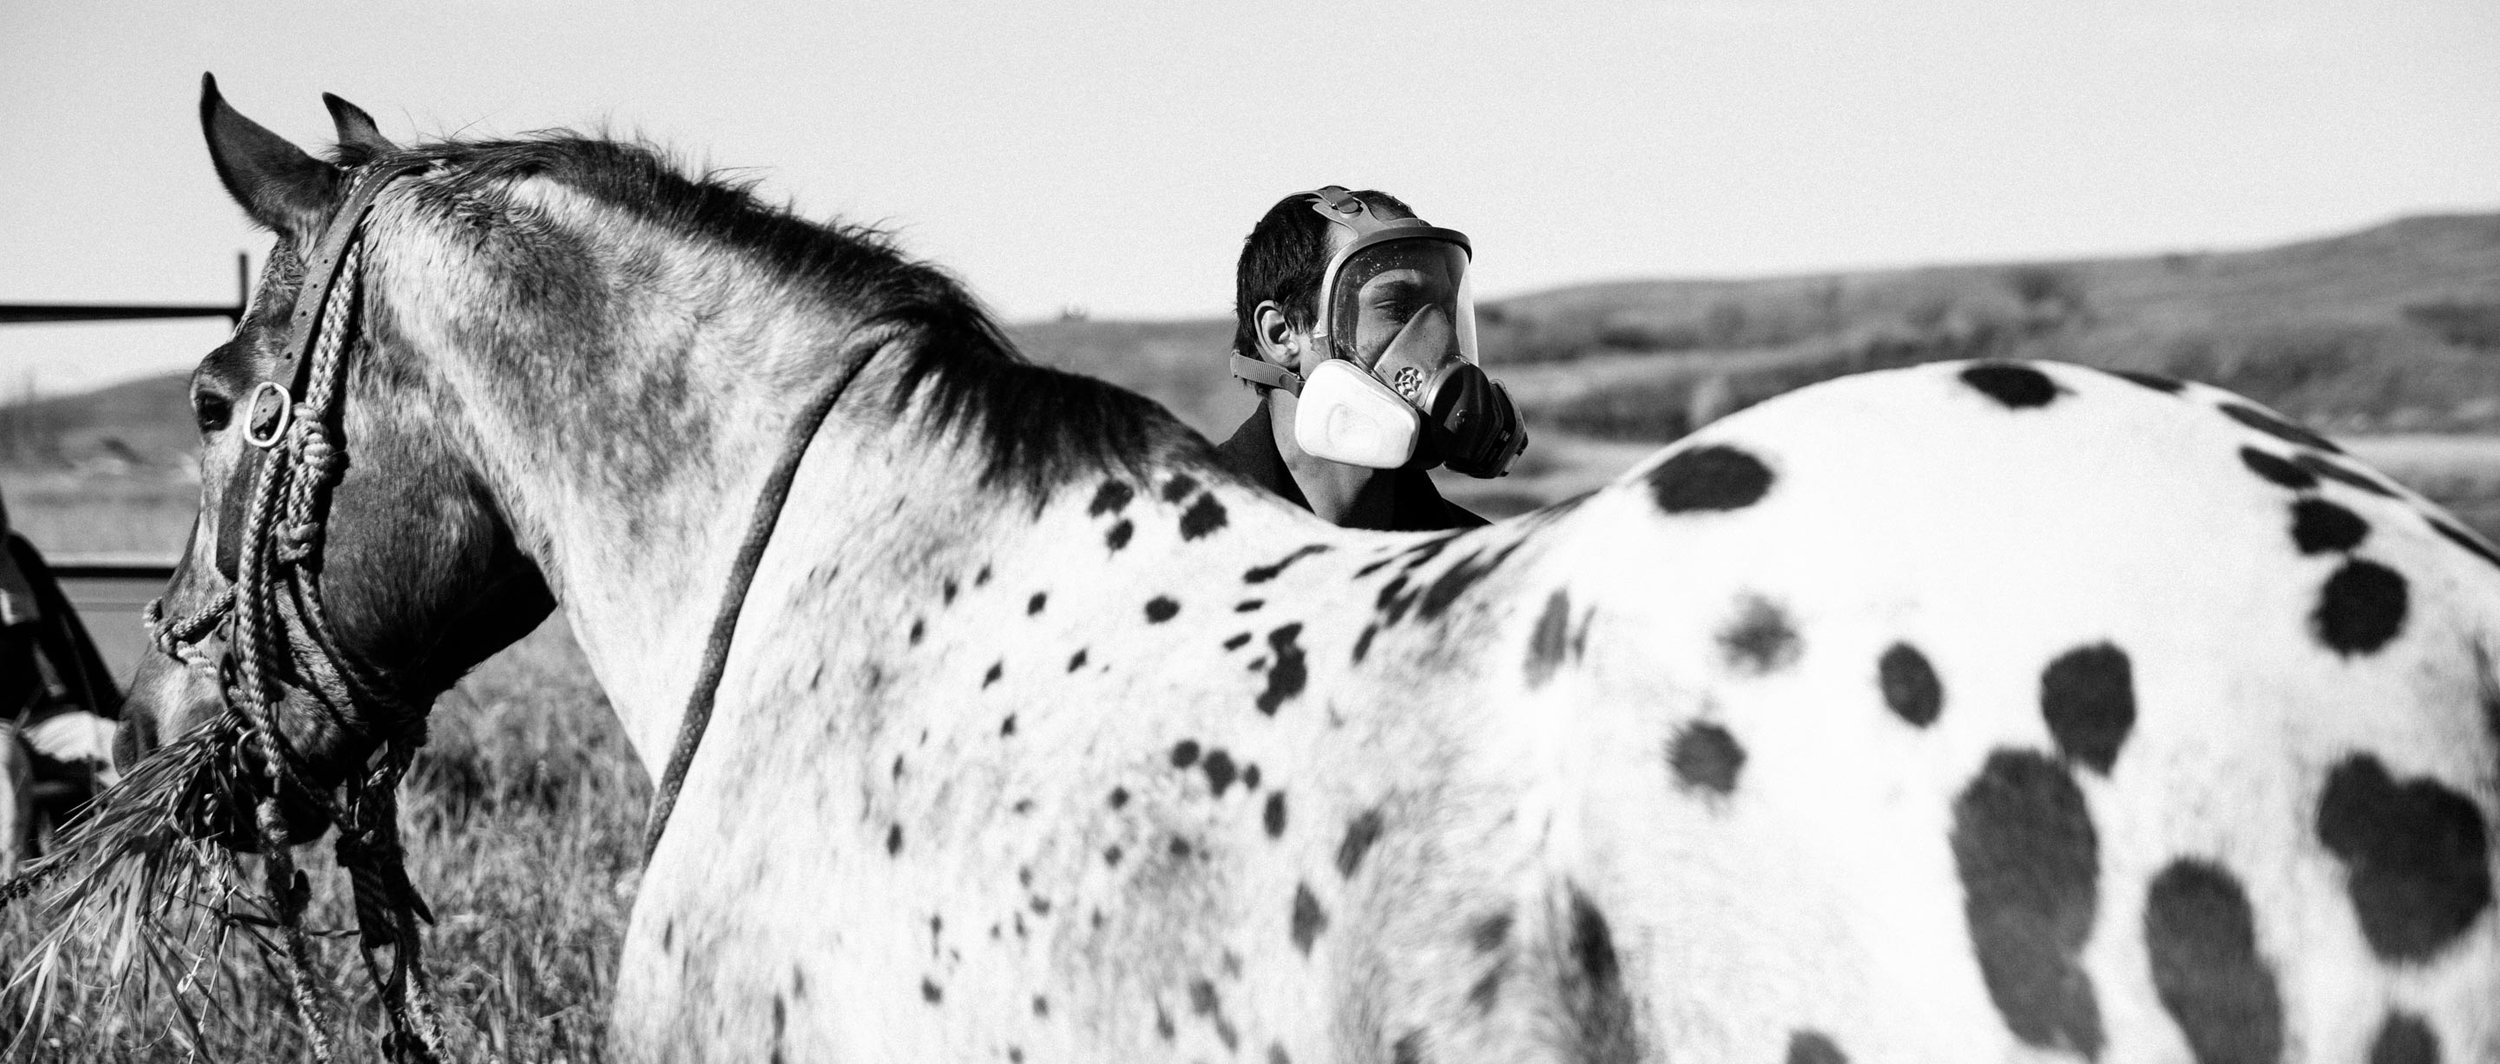 Standing_Rock_Nicholas_Small-9.jpg